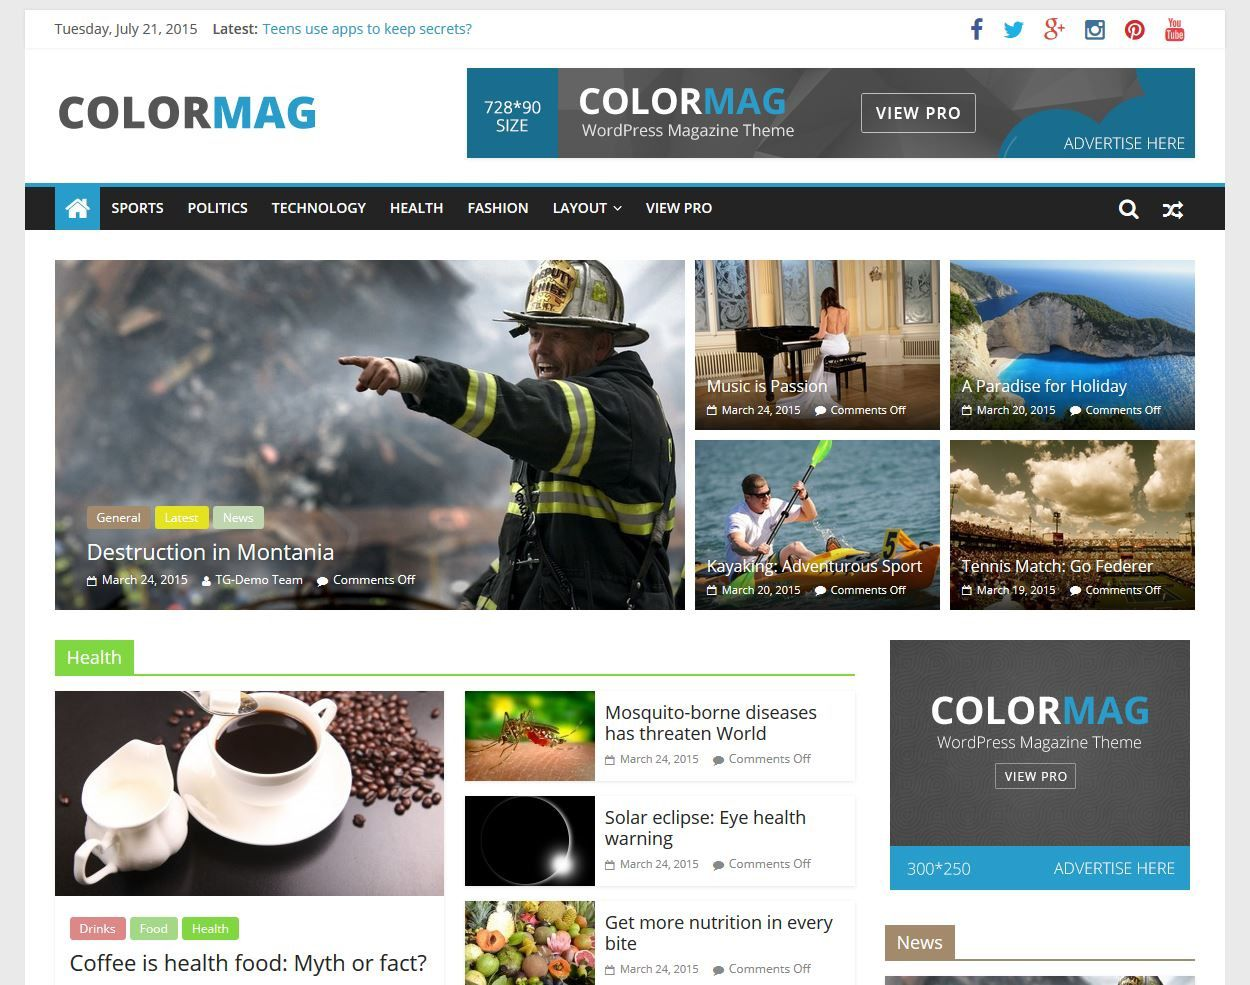 002 Breathtaking One Page Website Template Free Download Wordpres Design  WordpressFull